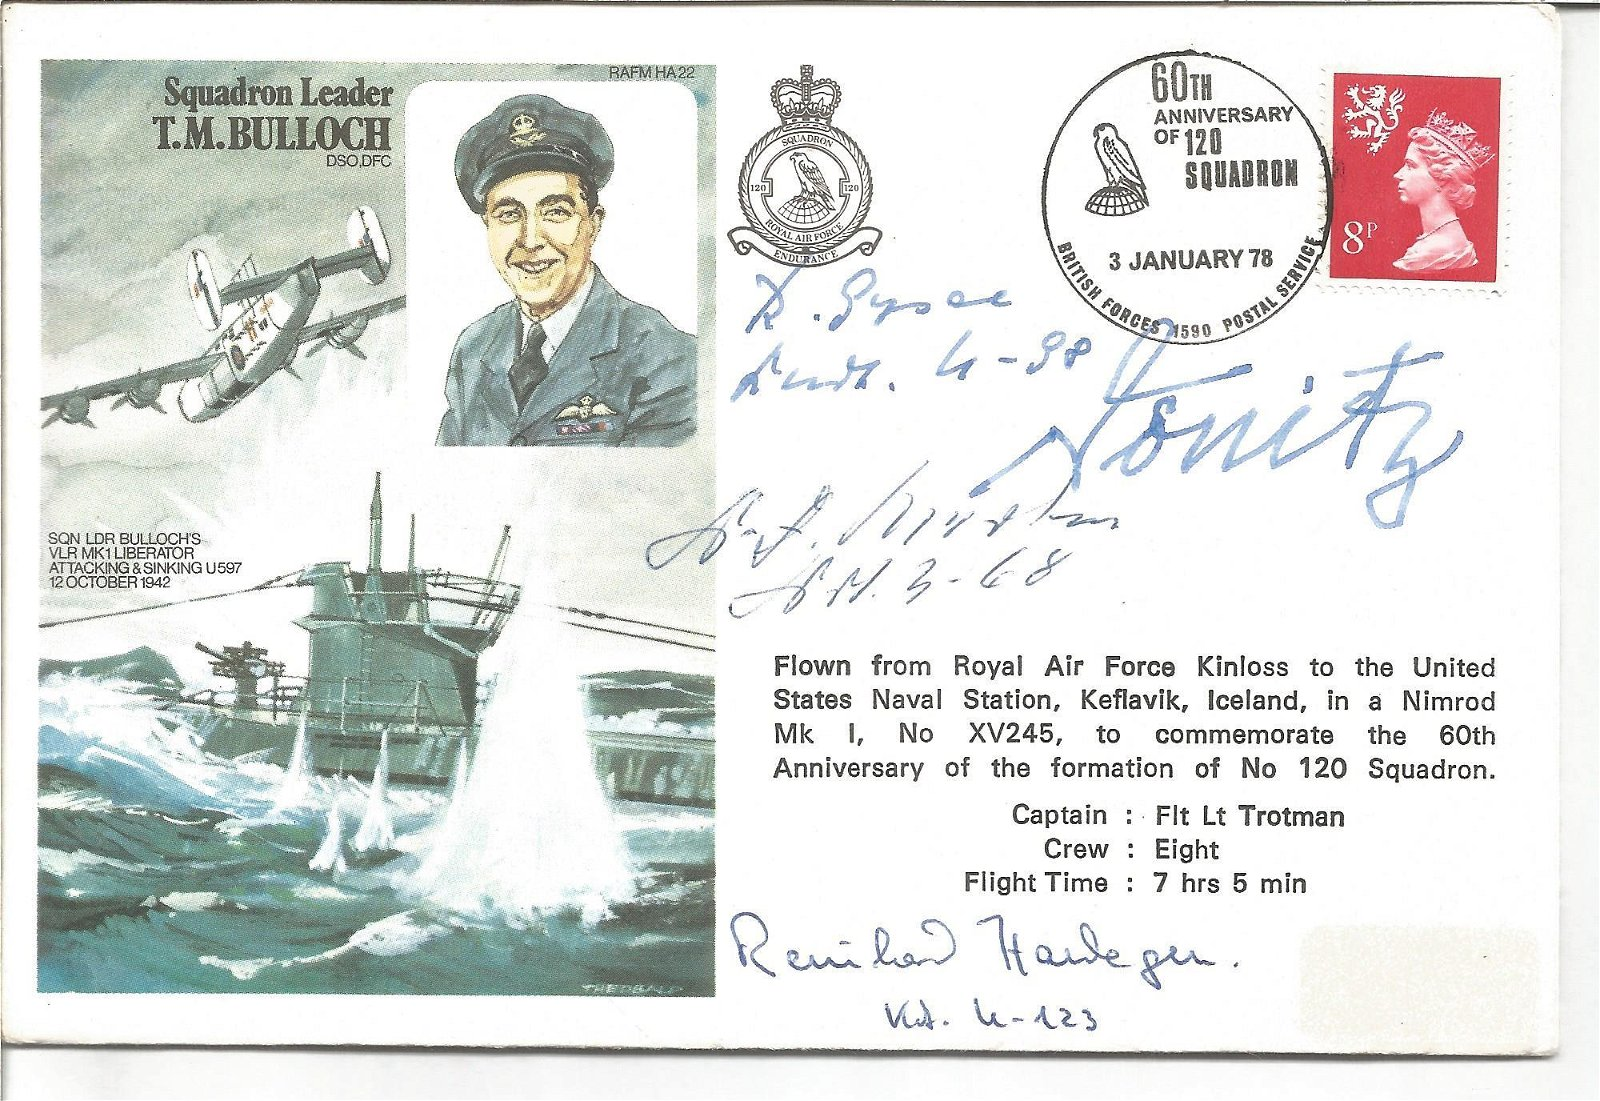 Rare WW2 Uboats commanders signed Sqn Ldr Bulloch